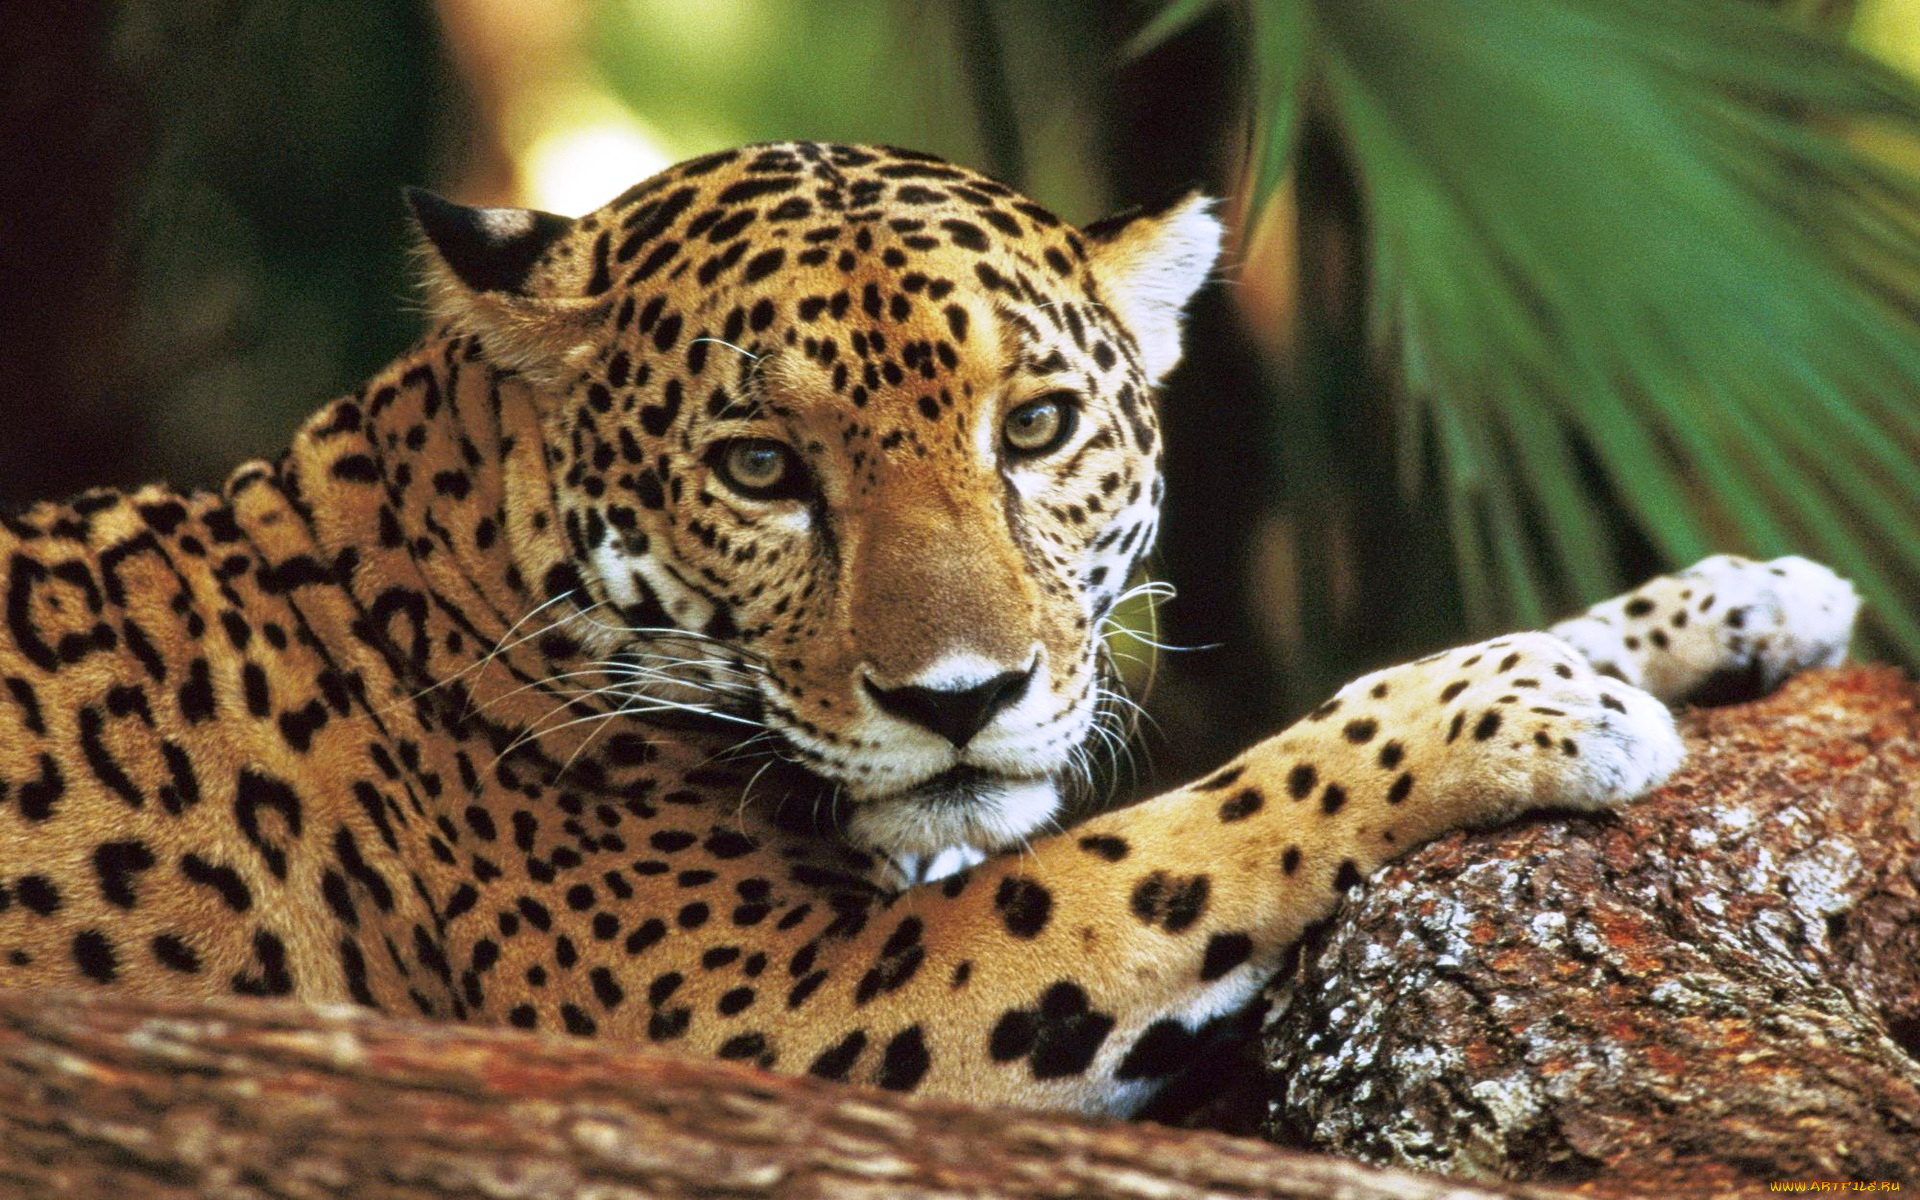 Ягуар хищник взгляд камни  № 3657942 бесплатно